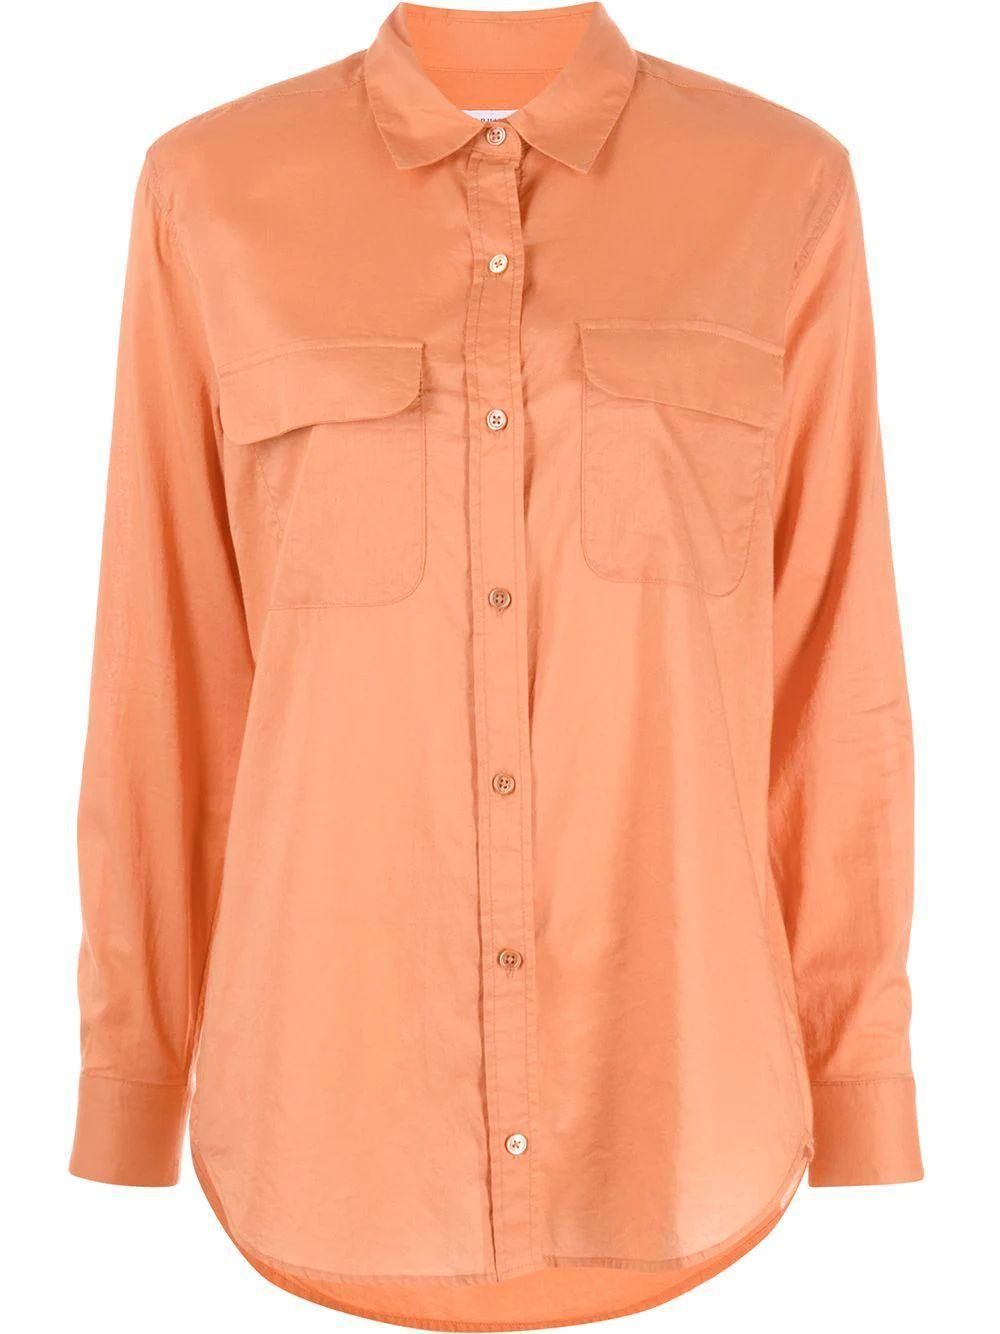 Signature Button Down Shirt